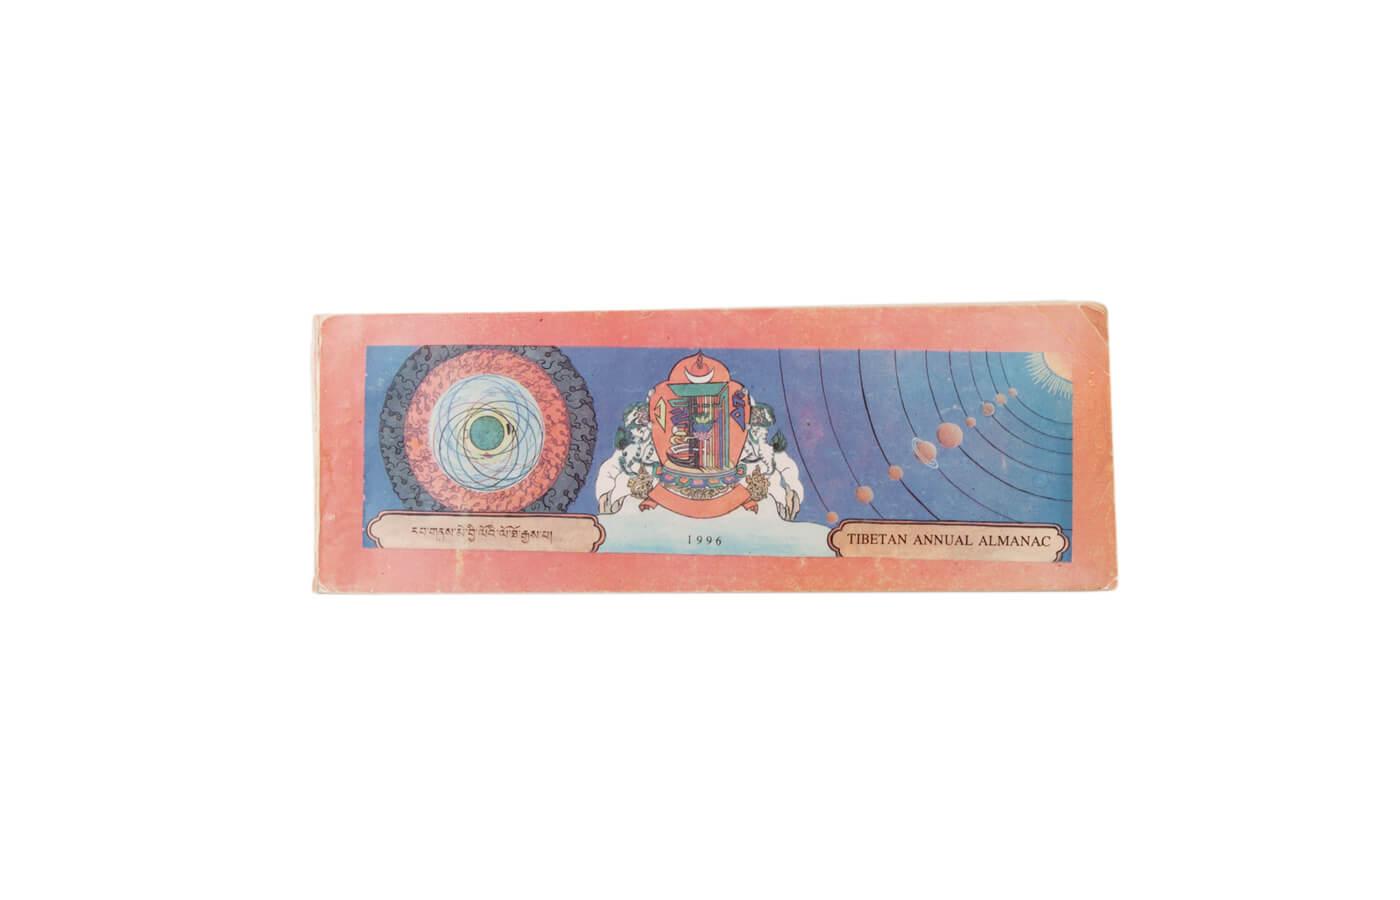 Tibetan Annual Almanac